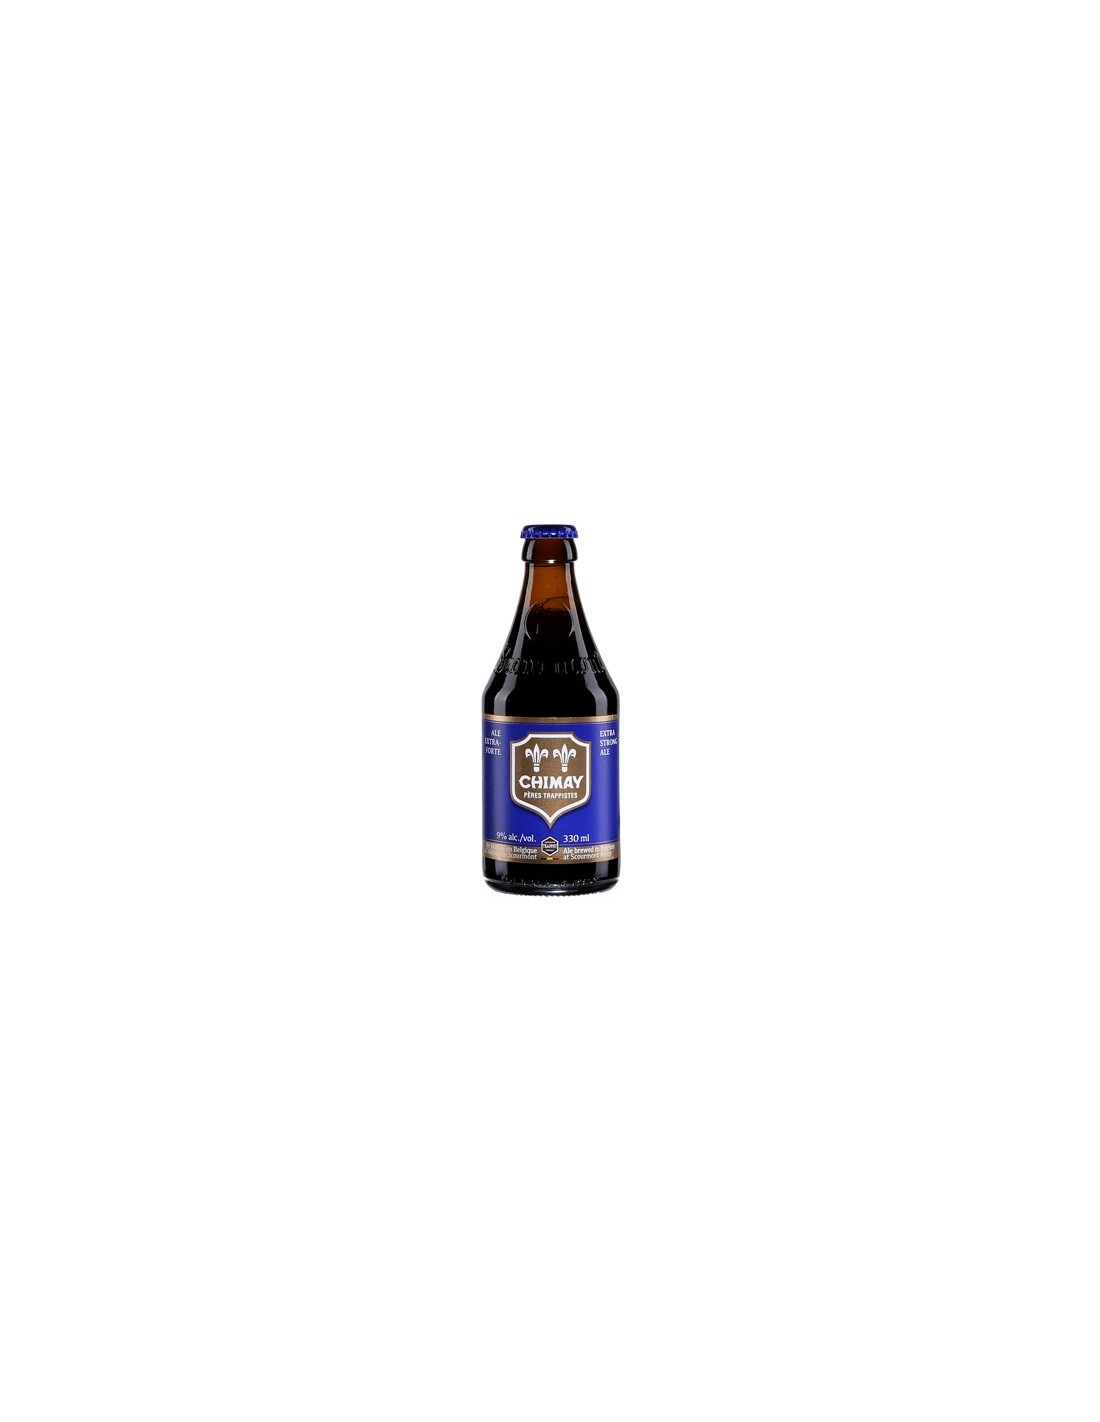 Bere blonda, nefiltrata Chimay Blue, 9% alc., 0.75L, Belgia